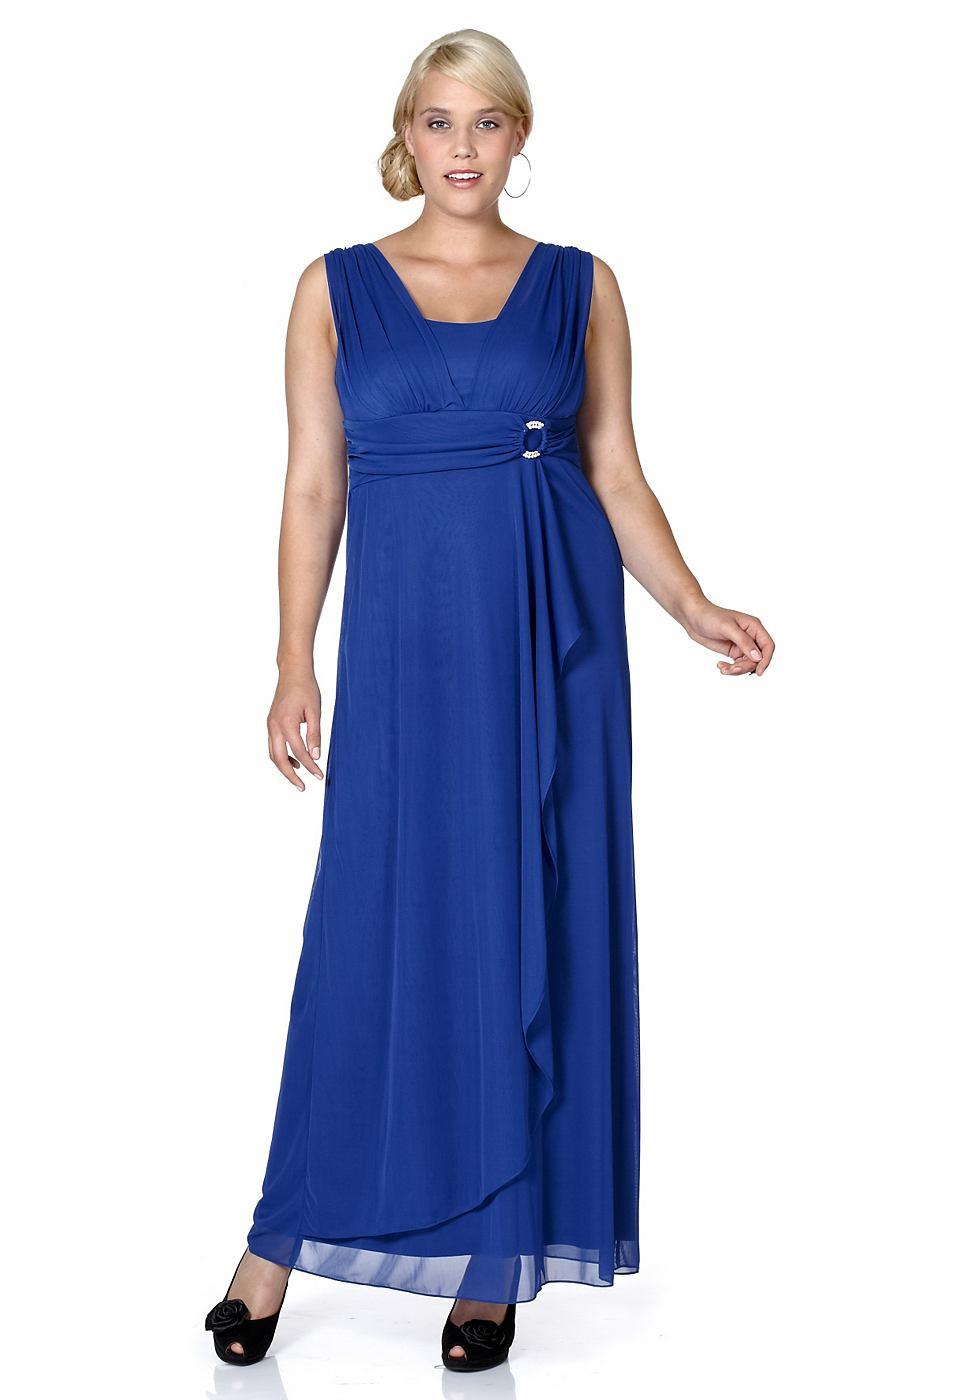 M.I.M jurk in gala-look blauw